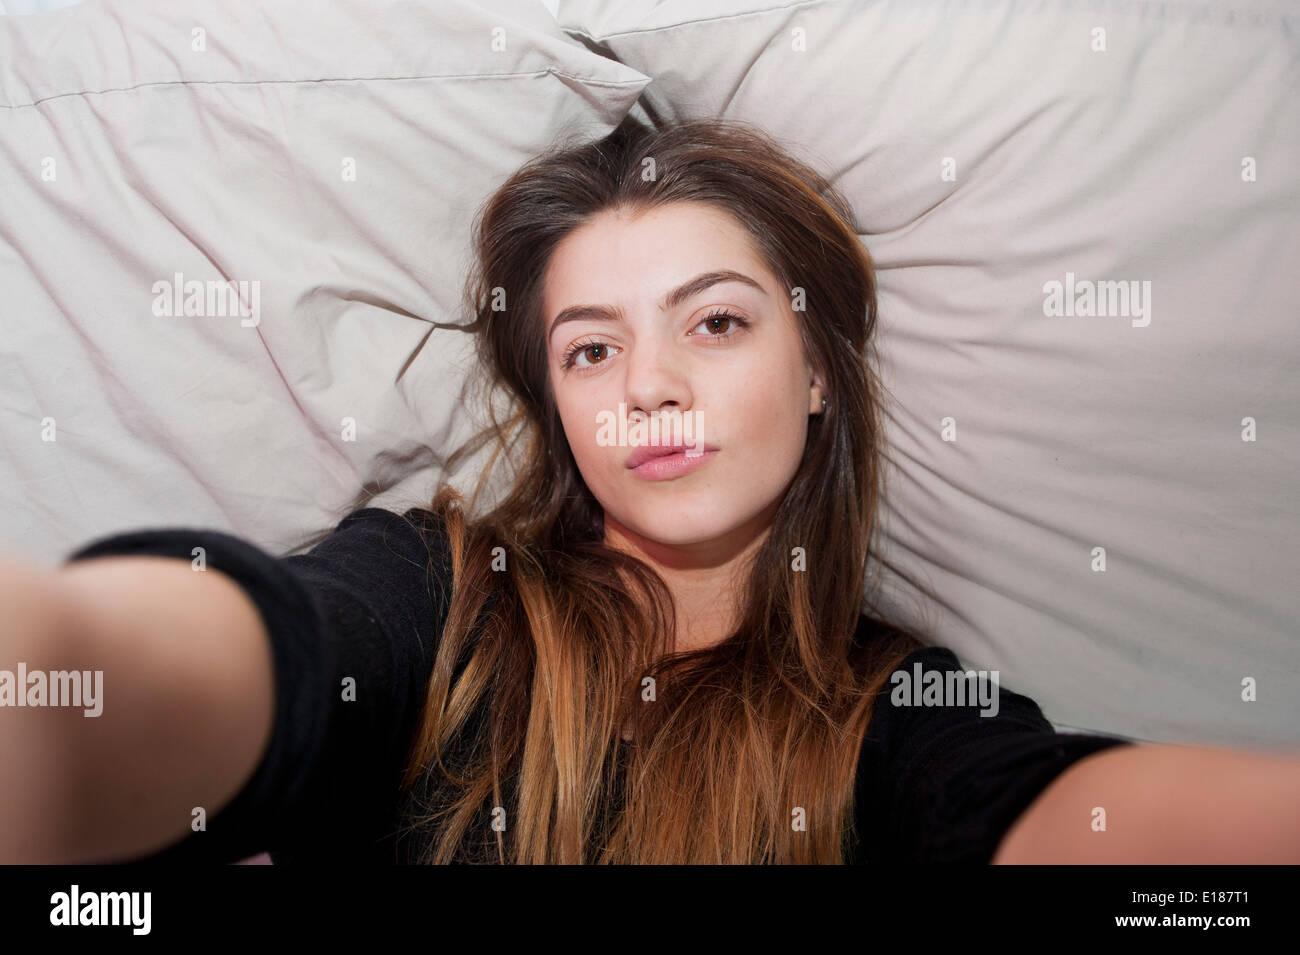 teenage 13 year old girl posing for a pretend selfie in. Black Bedroom Furniture Sets. Home Design Ideas